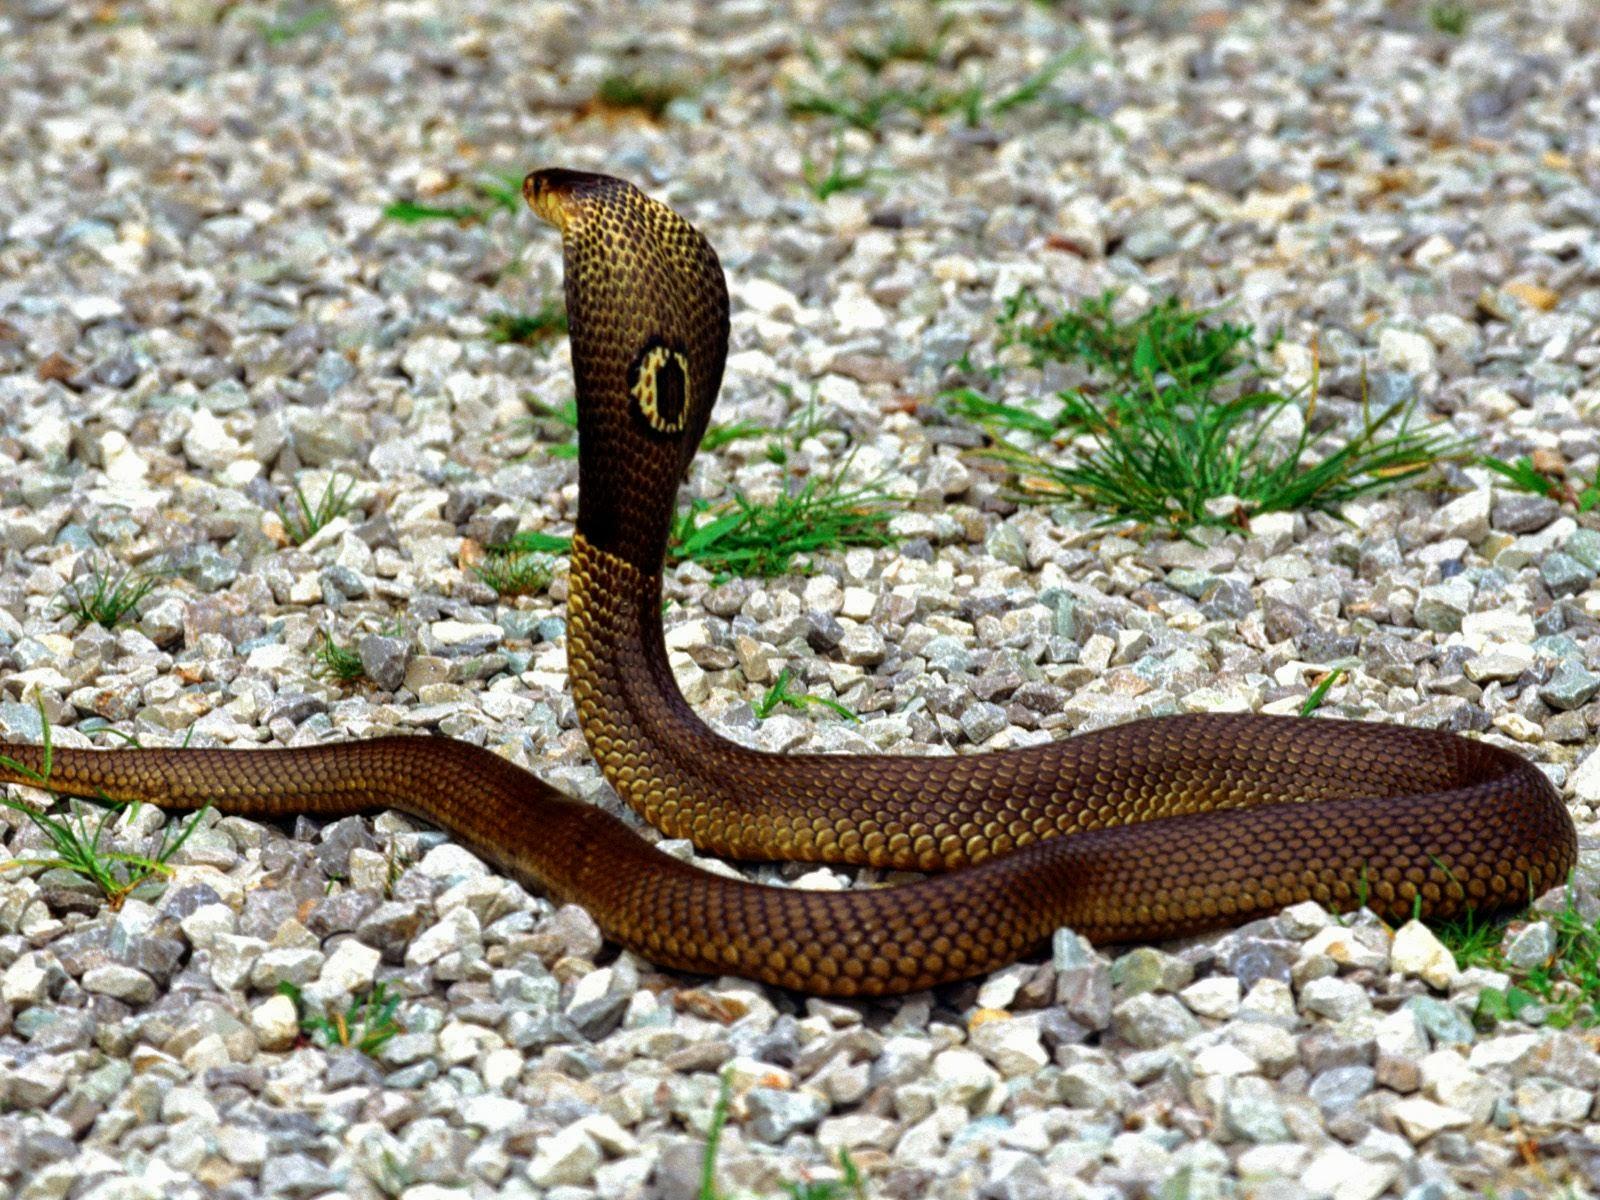 King Snake Hd Pictures Fantastic Snake Wallpaper: Knowledge Point: King Cobra Snake Facts